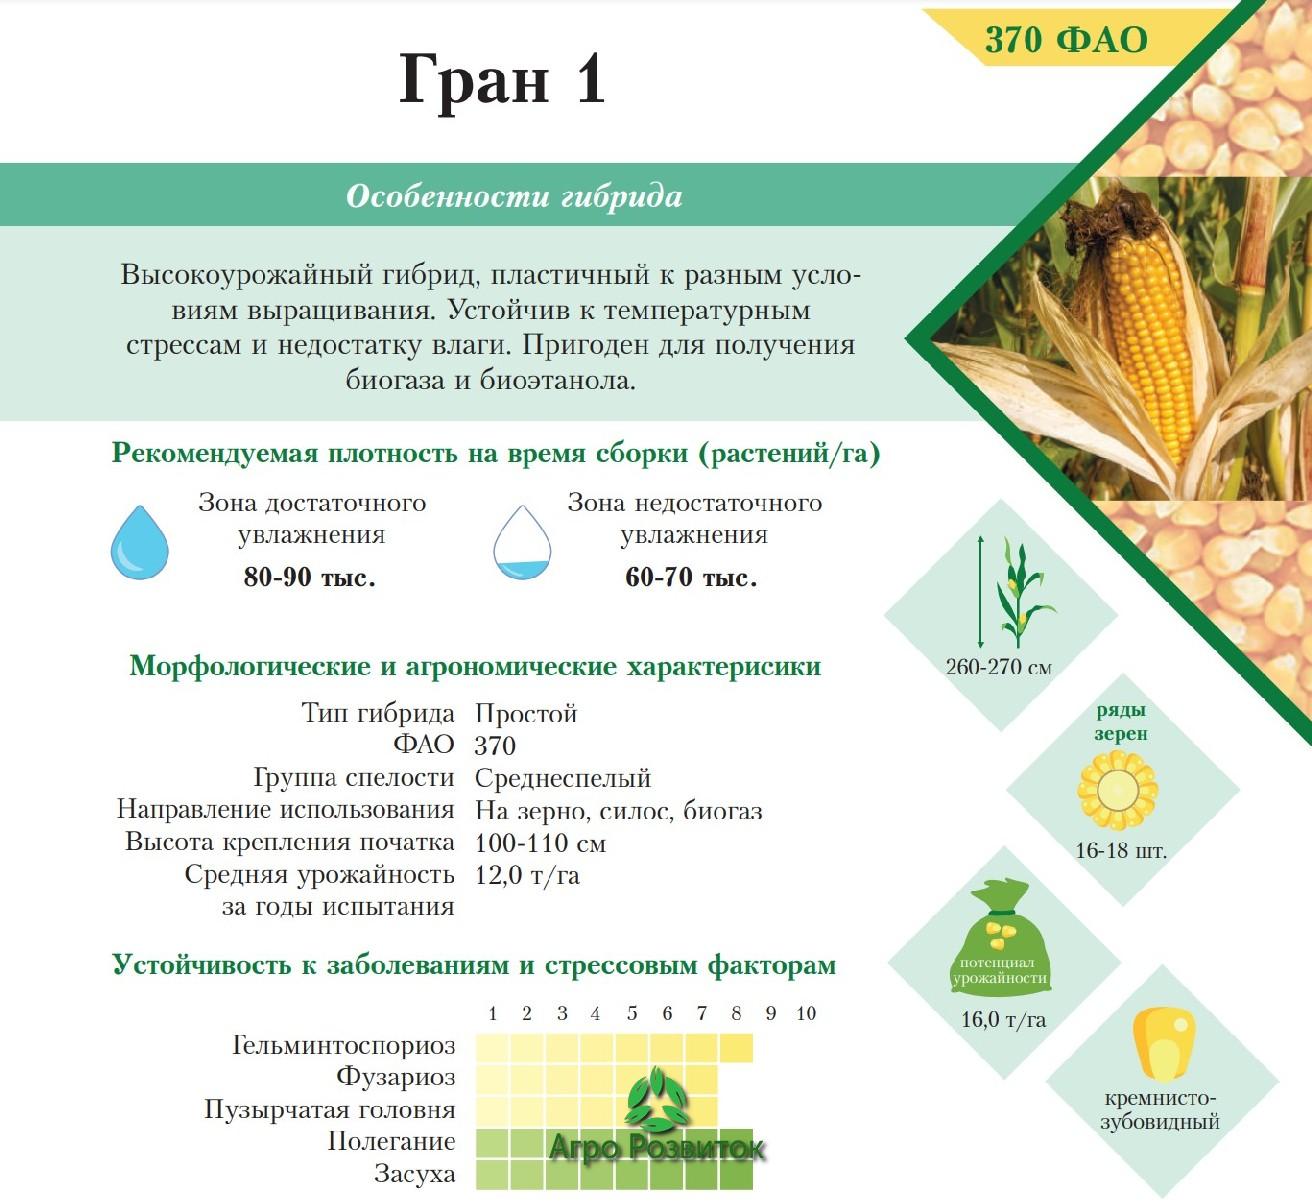 Кукуруза Гран 1 - Цена Семян (ФАО 370)